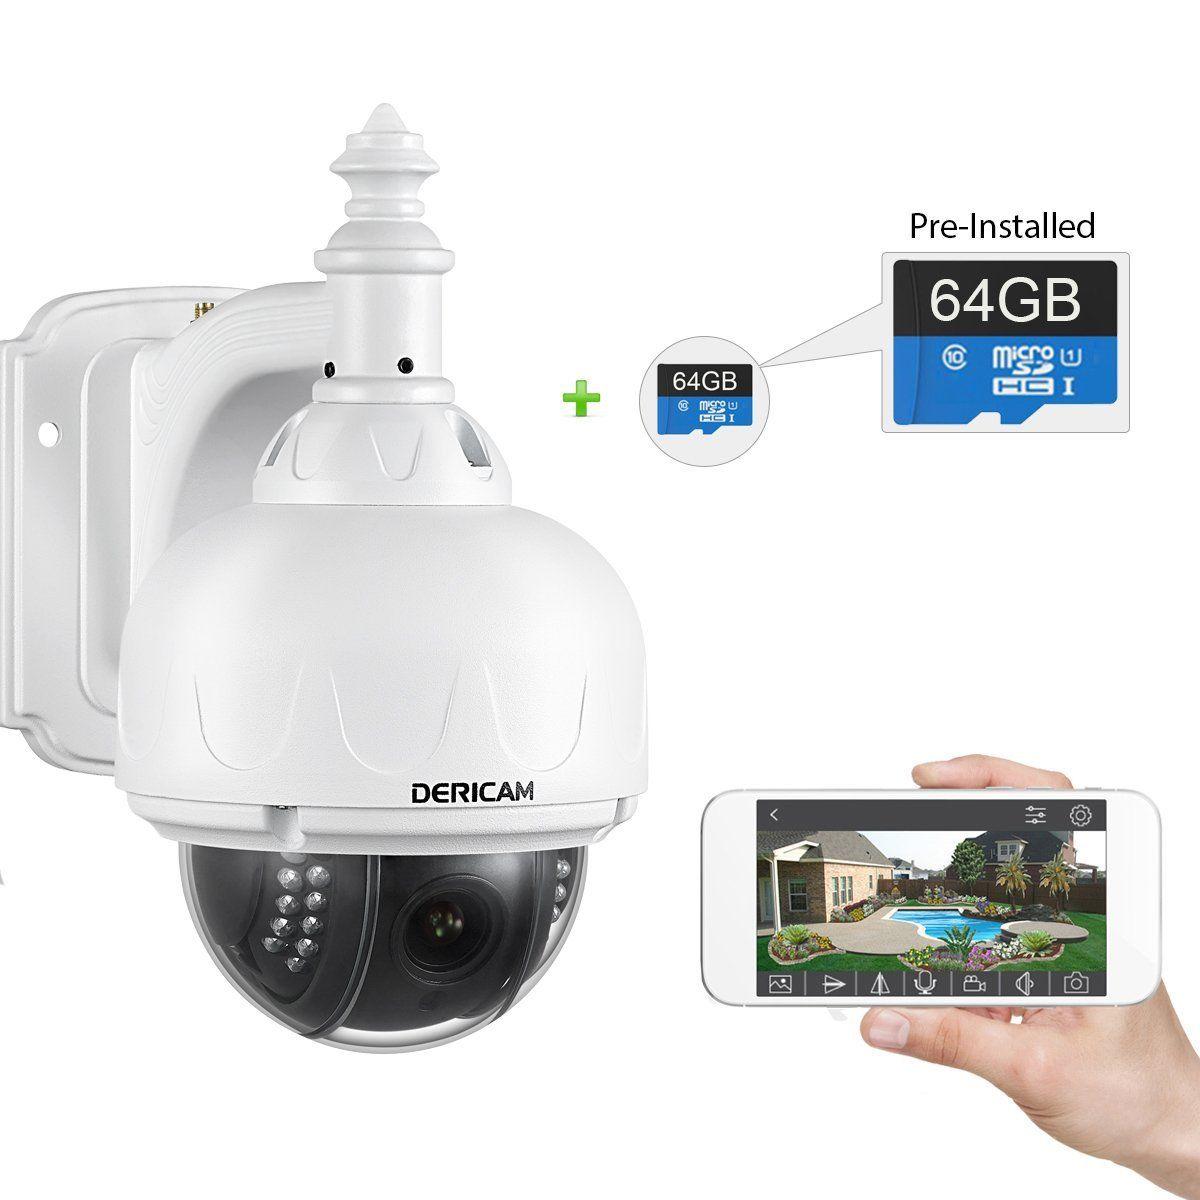 Dericam Wifi Wireless Outdoor Ip Security Camera Ptz Camera 4x Optical Zoom Auto Fo Wireless Home Security Security Cameras For Home Outdoor Security Camera